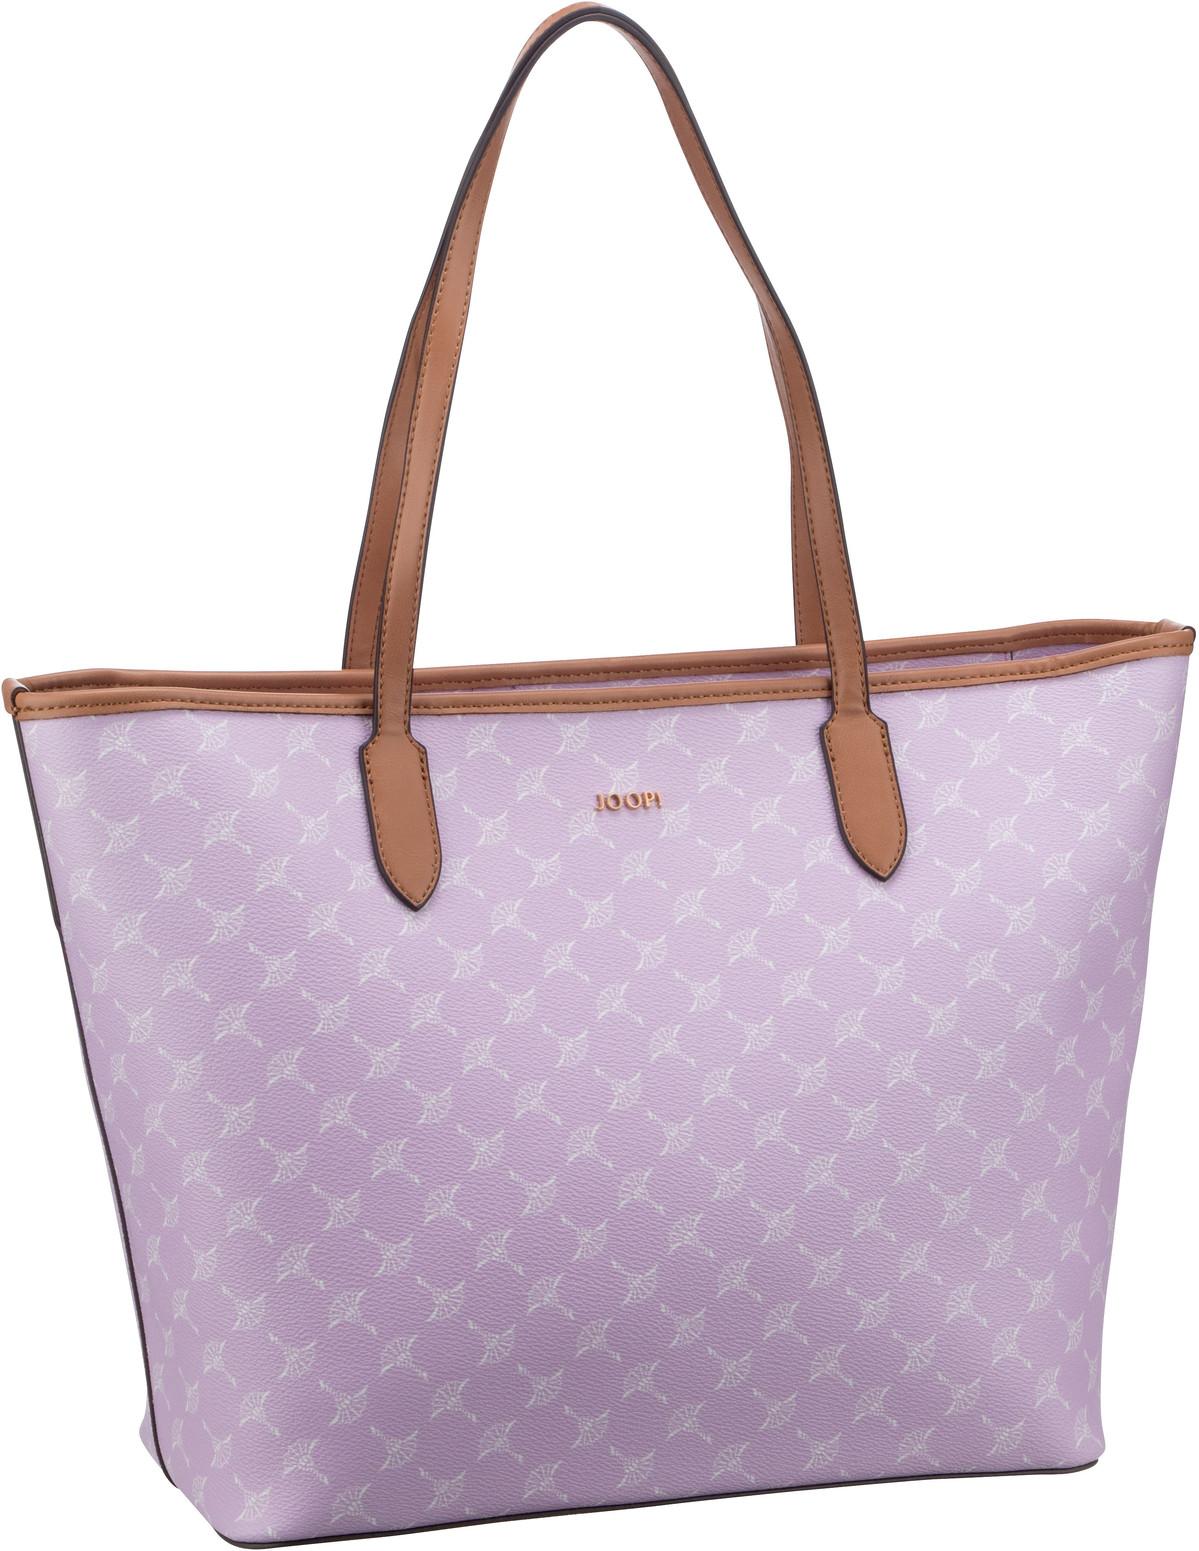 Handtasche Cortina Lara Shopper L Lavender